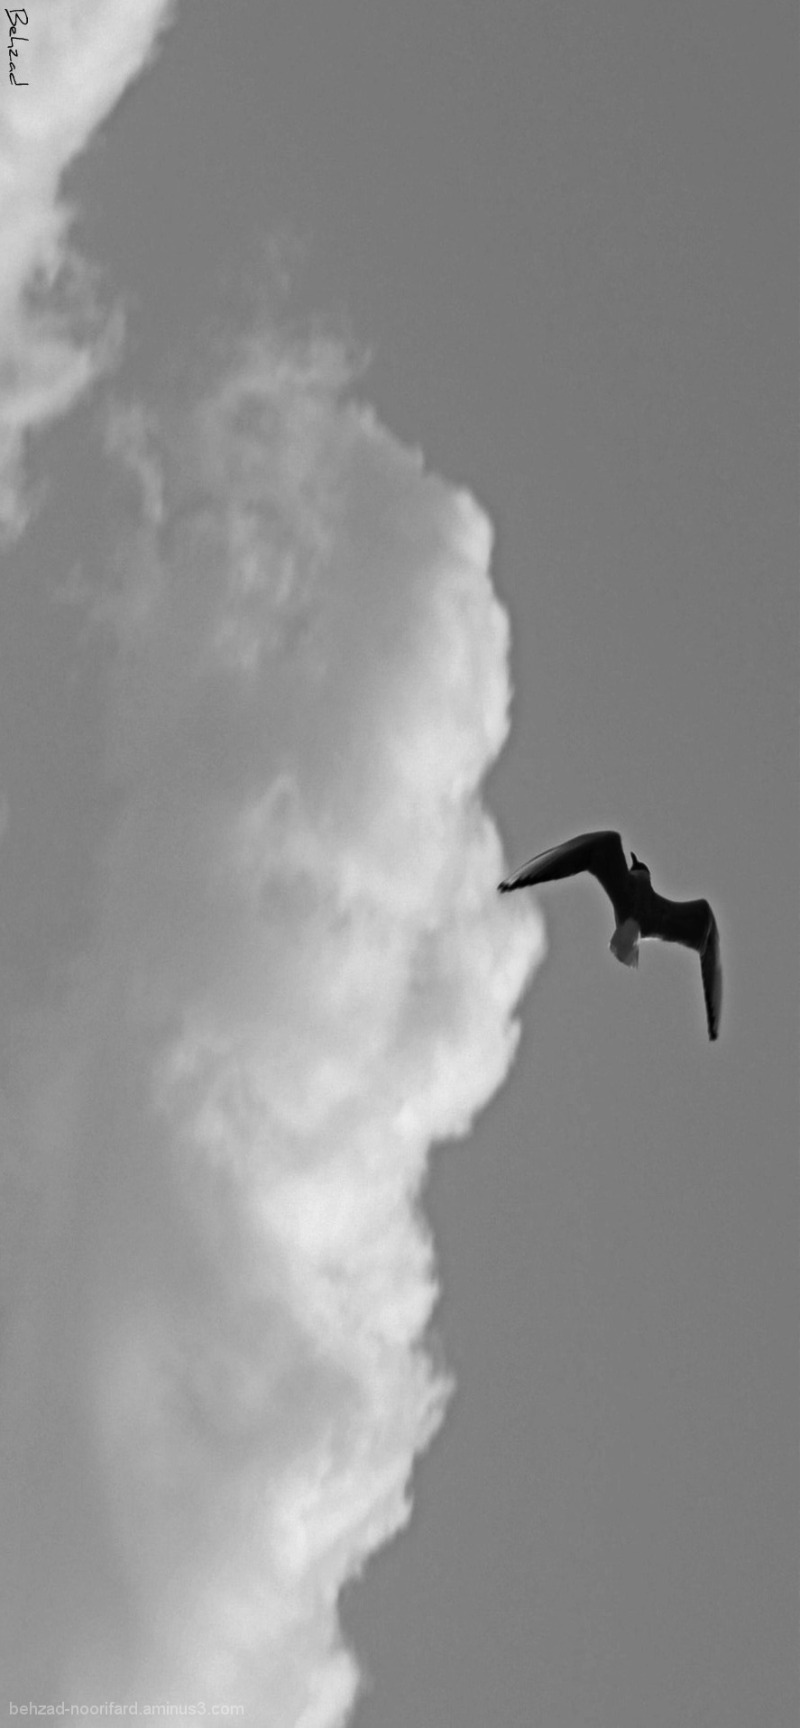 Fly between clouds